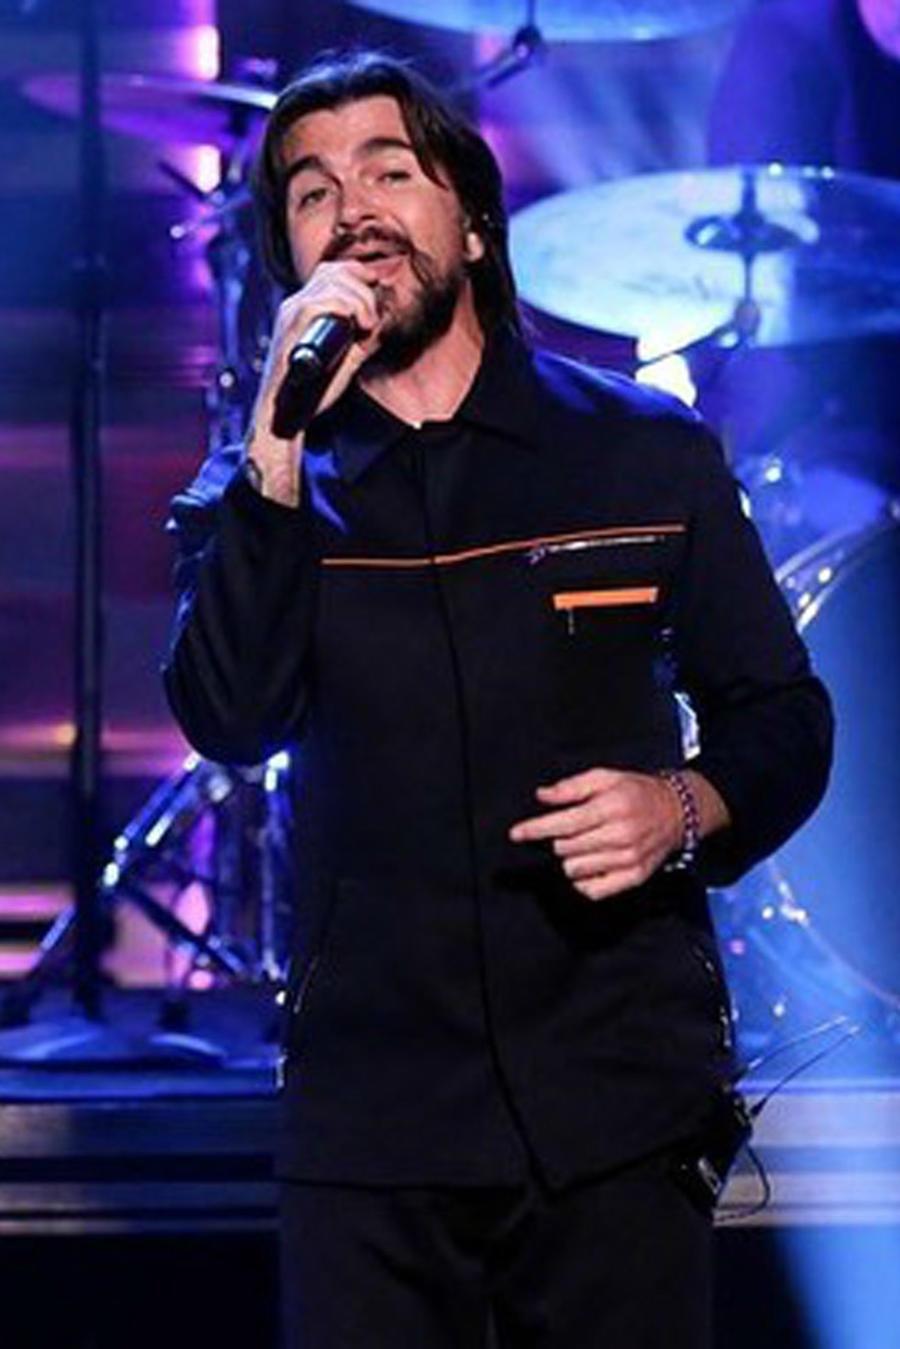 Juanes y Alessia Cara cantan Querer Mejor en The Tonight Show con Jimmy Fallon